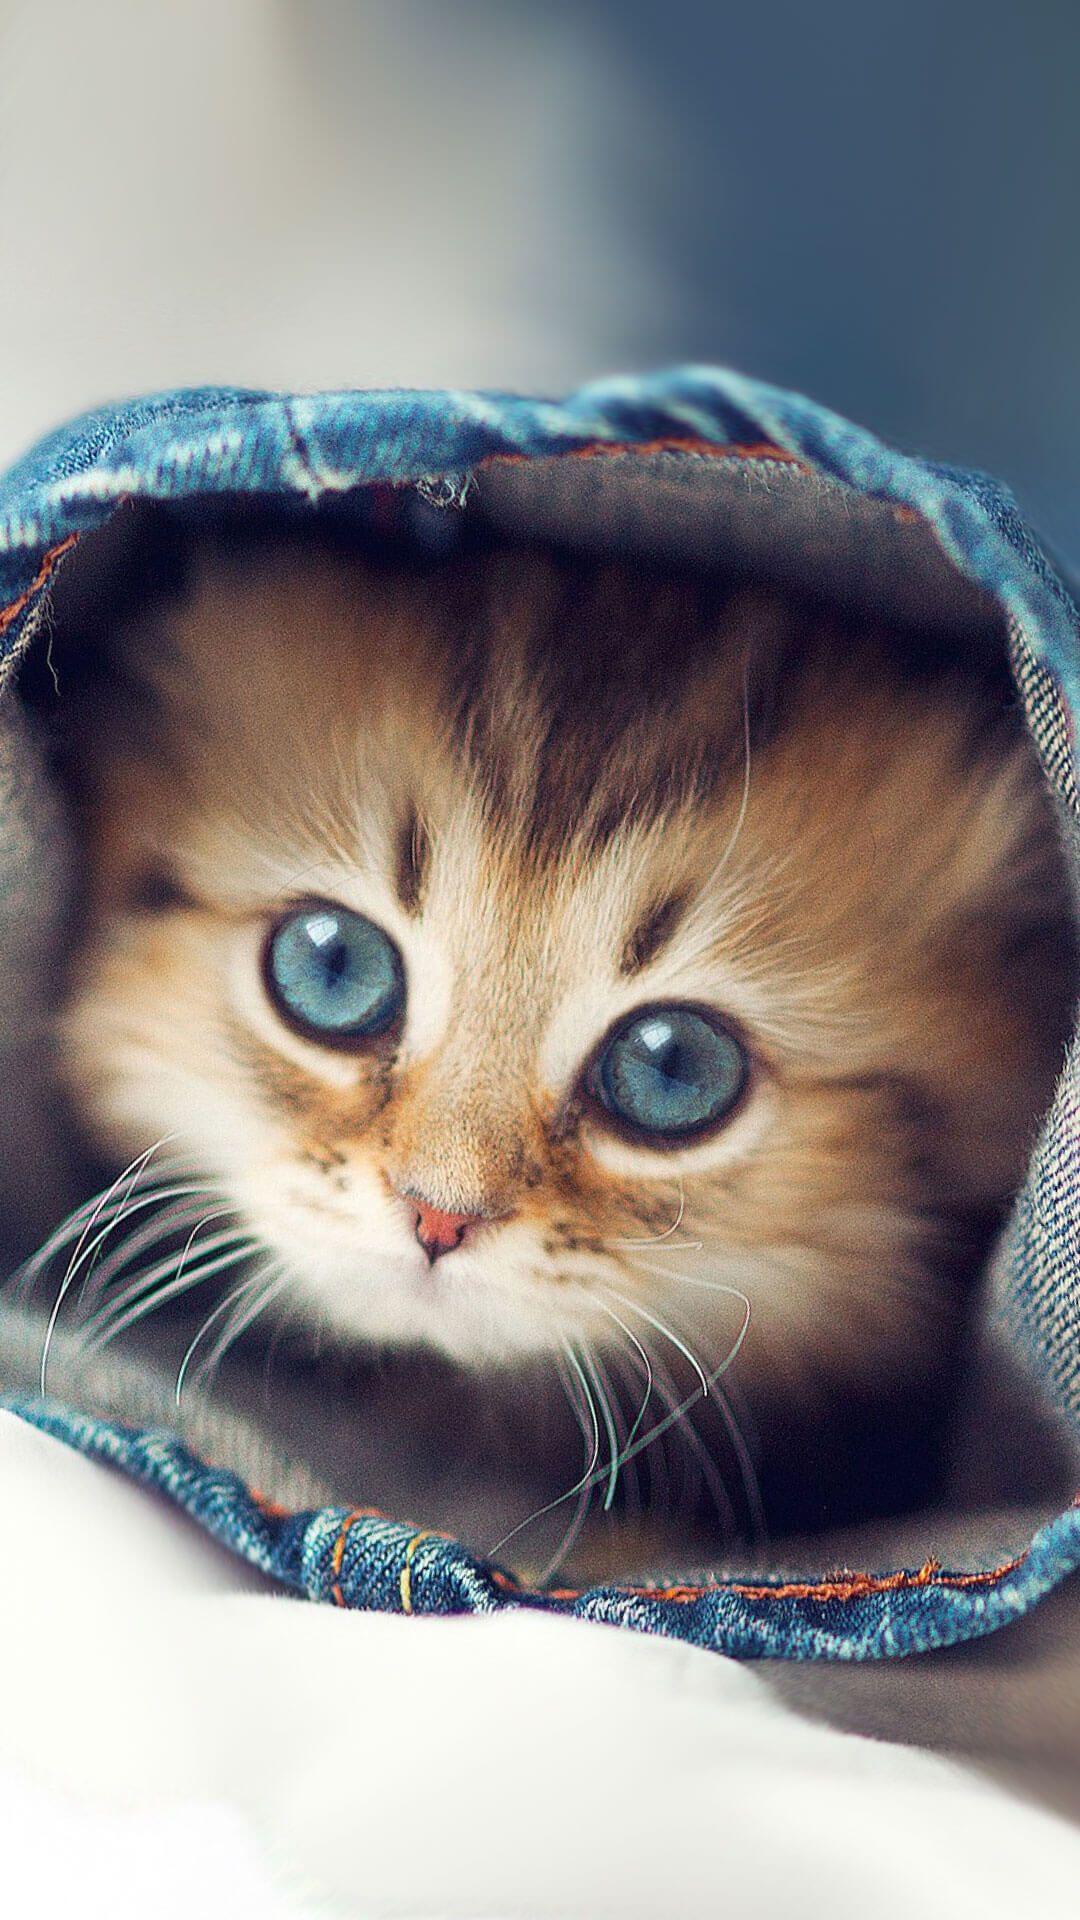 Cute Kittens Wallpapers For iPhone 6 HD Kitten wallpaper